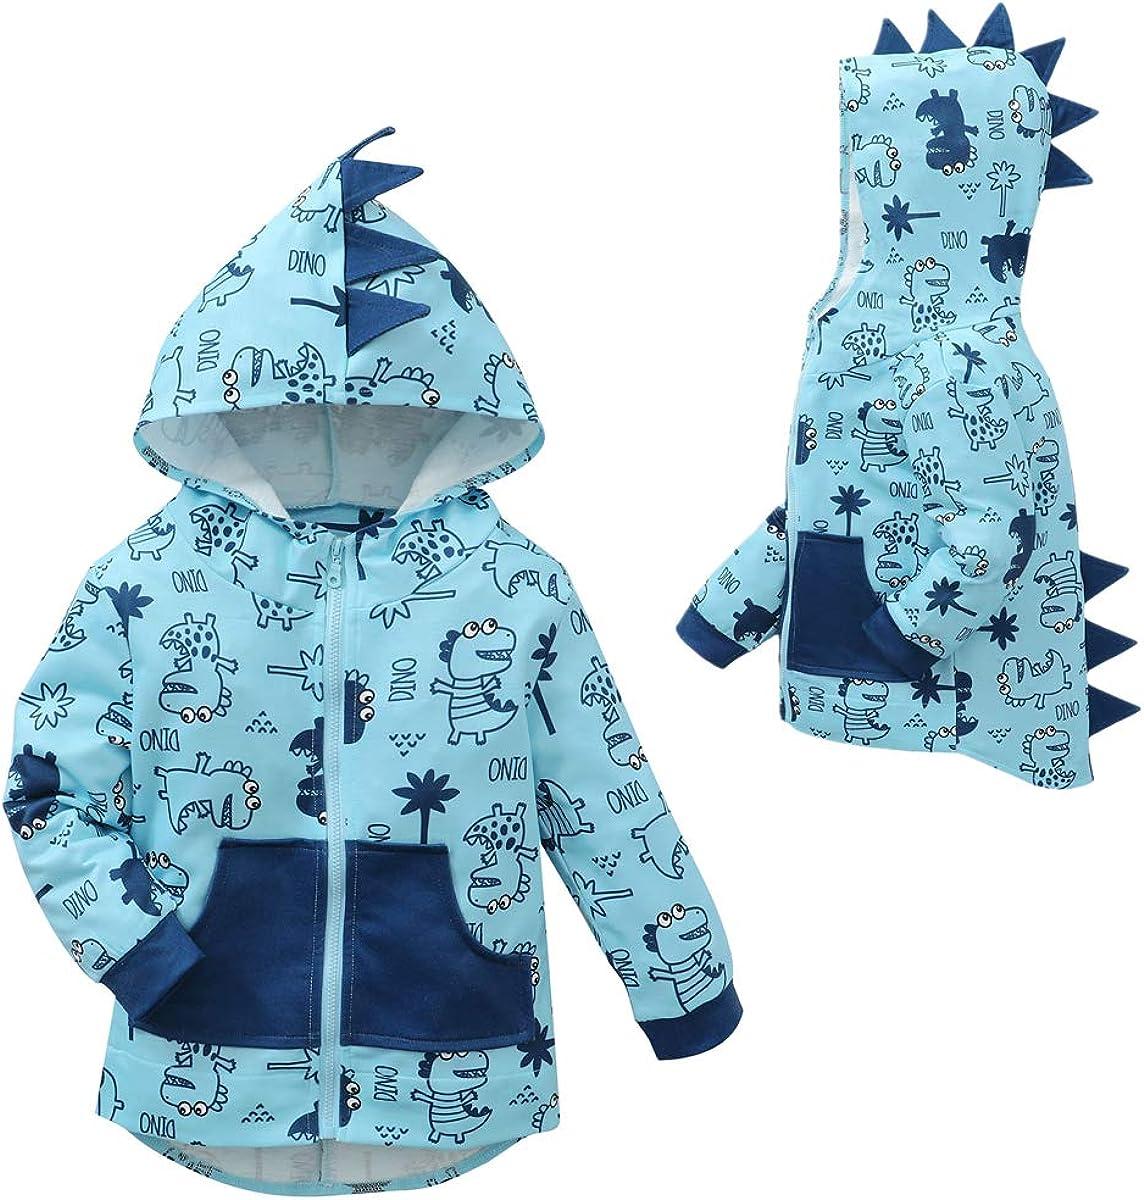 FANTANGPAI Baby Boy Girl Clothes Toddler Boy Dinosaur Hoodie Sweatshirt Hooded Jackets Full Zip